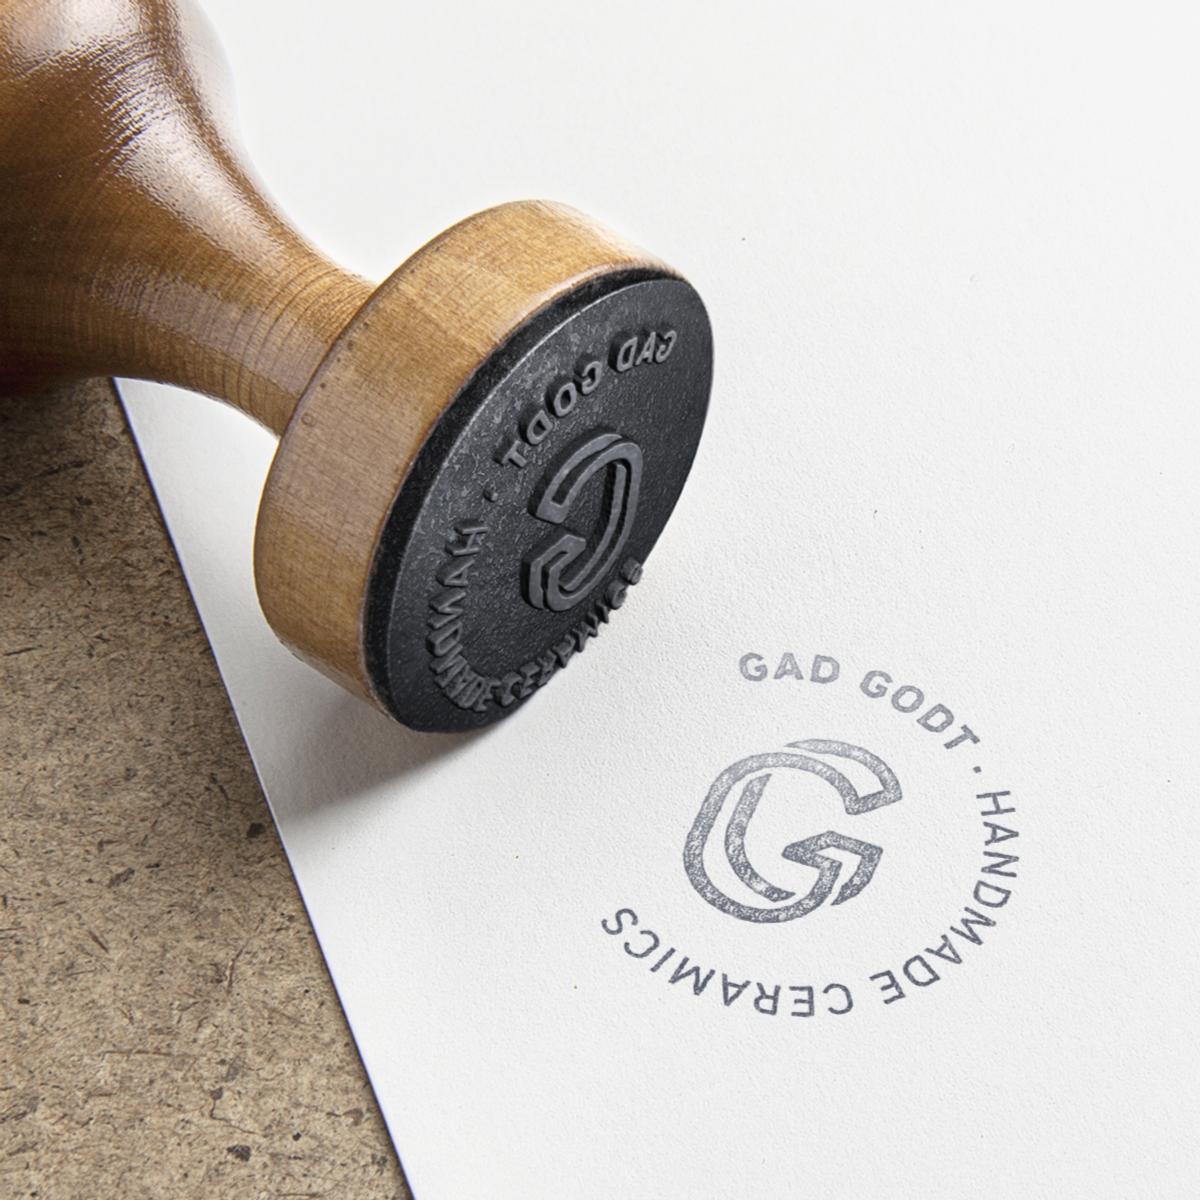 Gad Godt logo